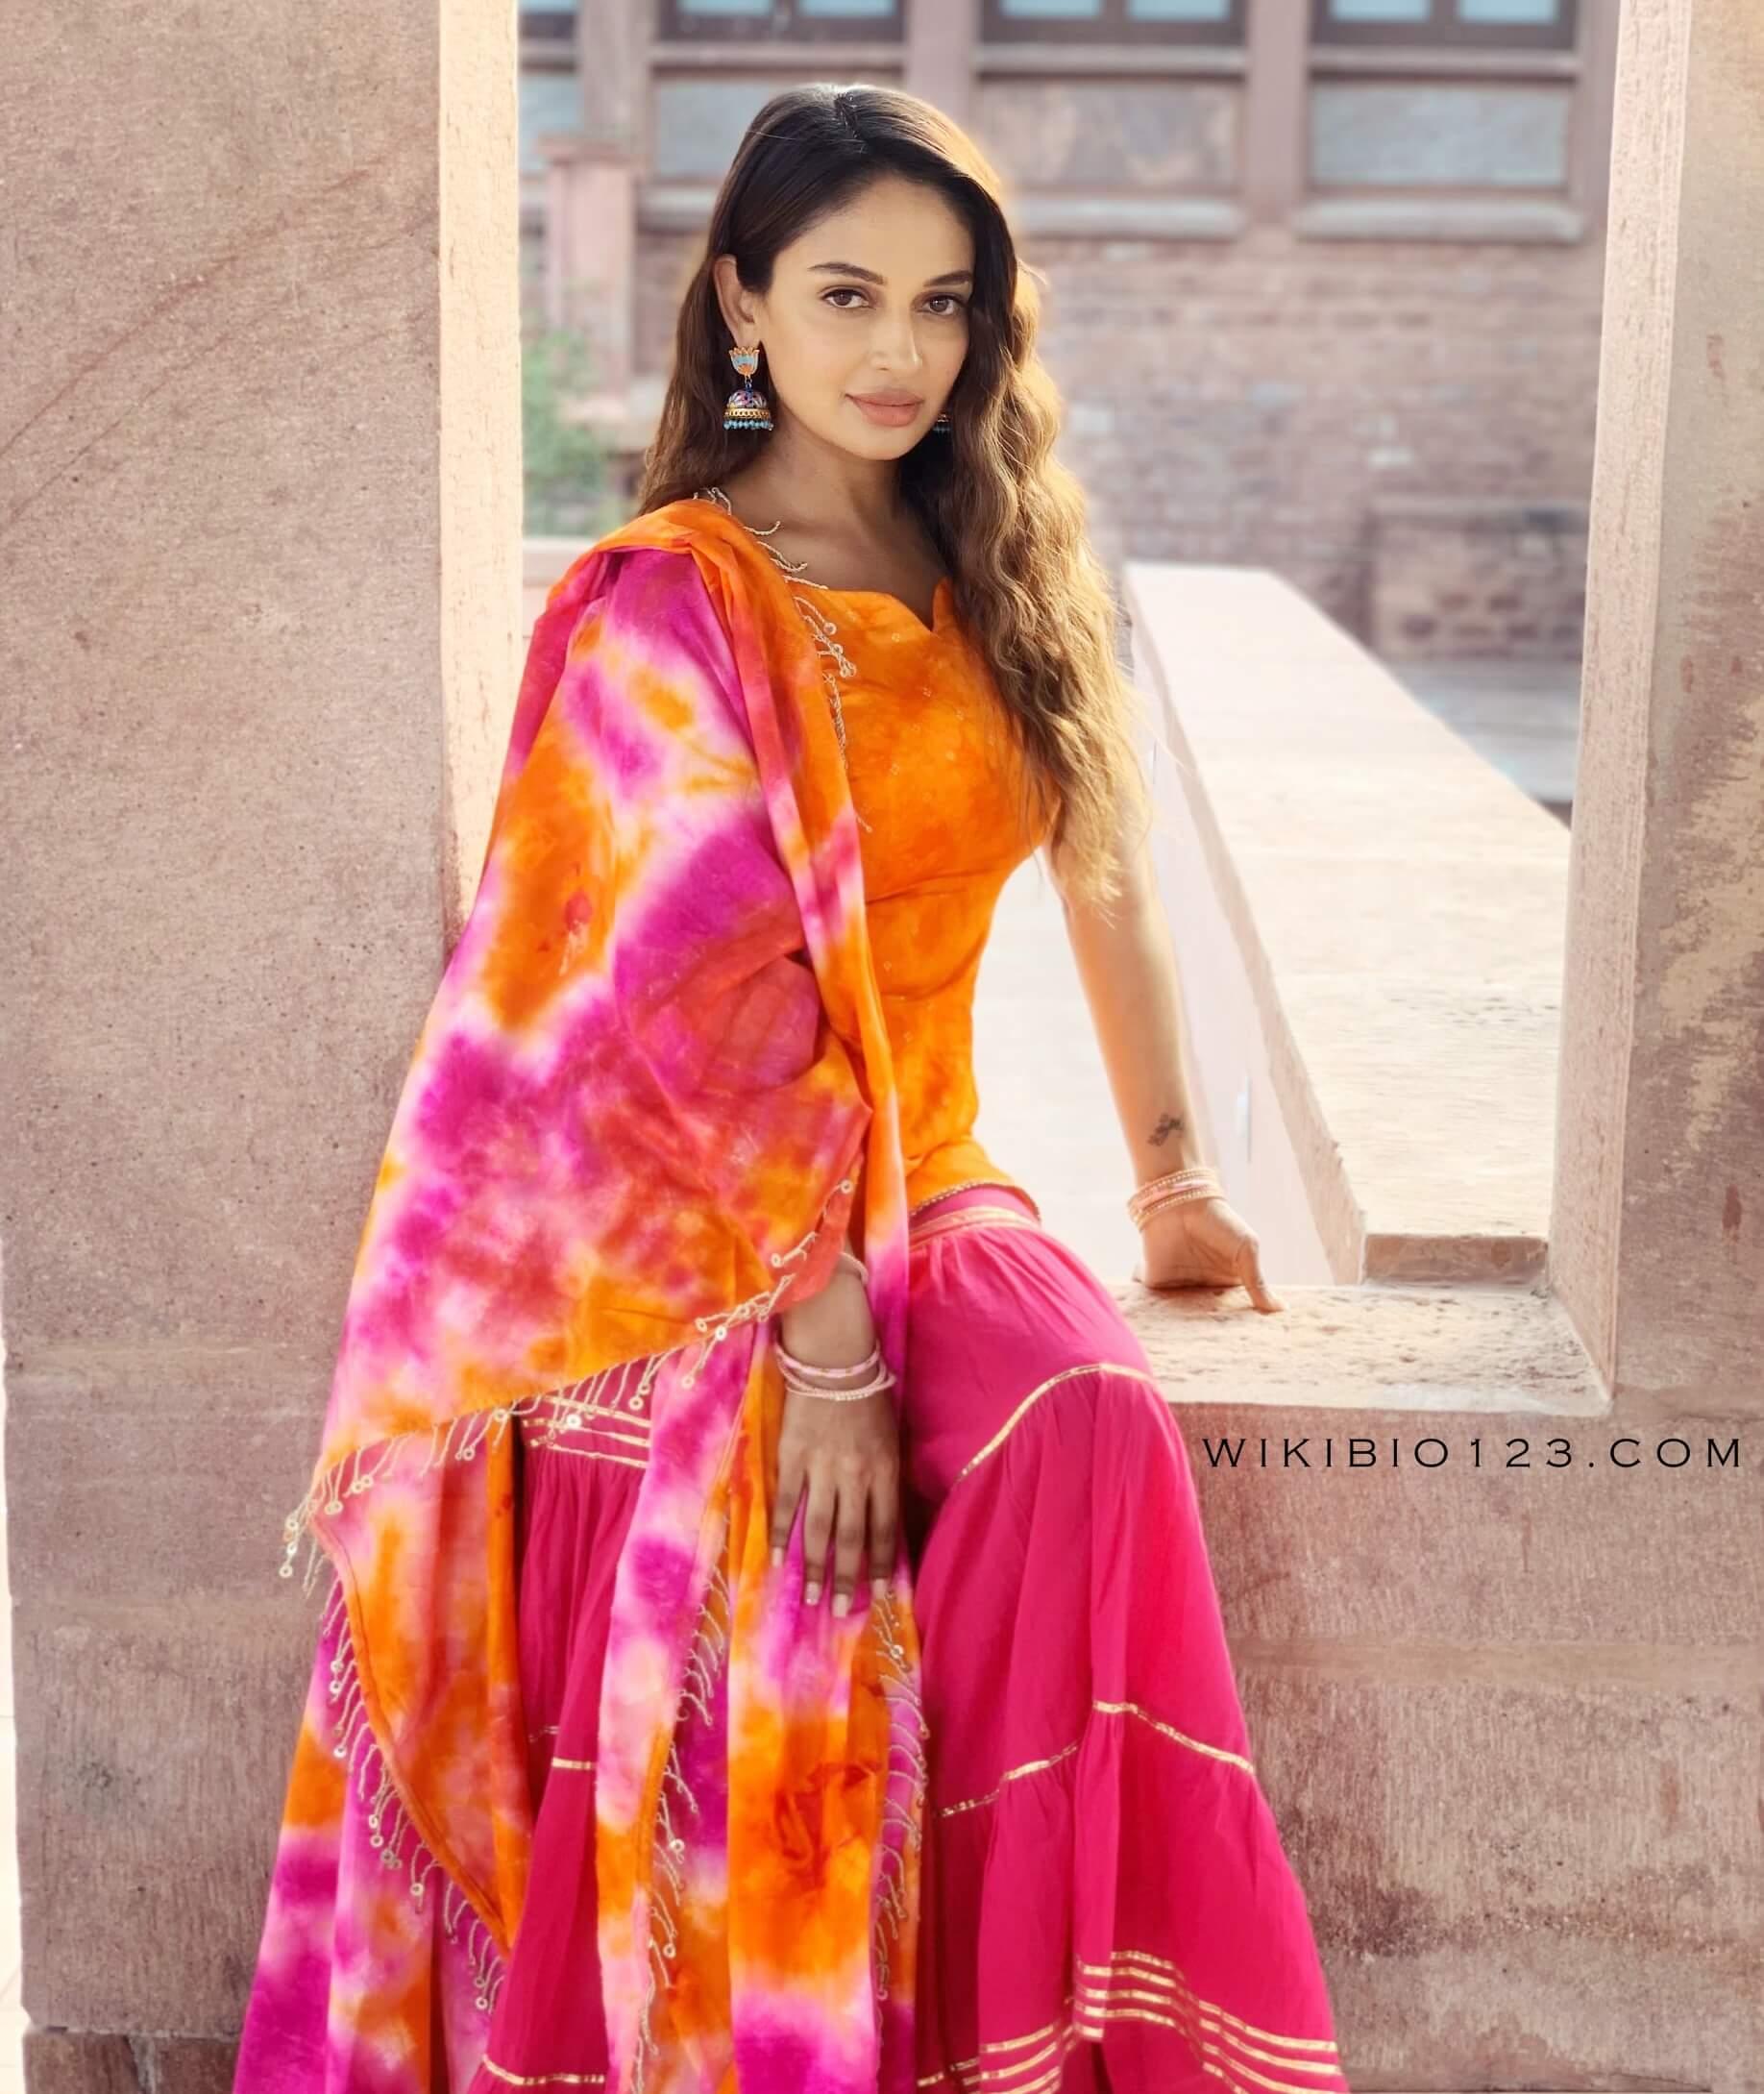 Rubina Bajwa HD Images Wallpapers Photos